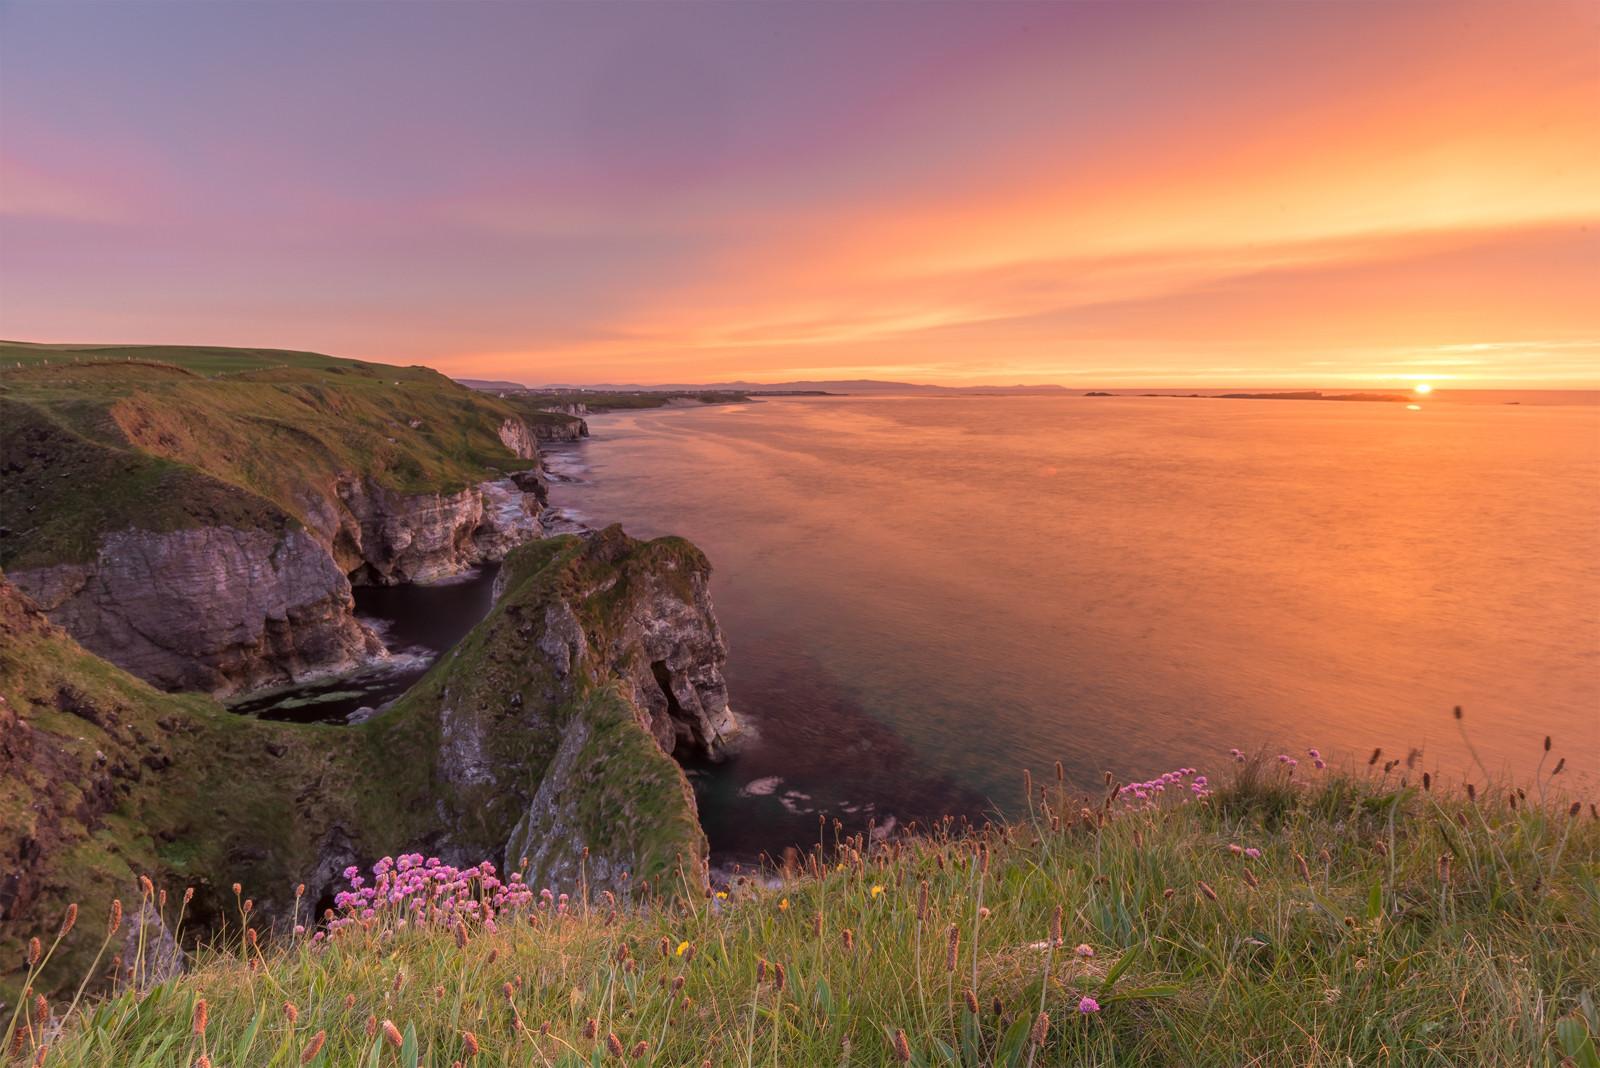 COLOUR - White Rocks Sunset by Philip Blair (8 marks)